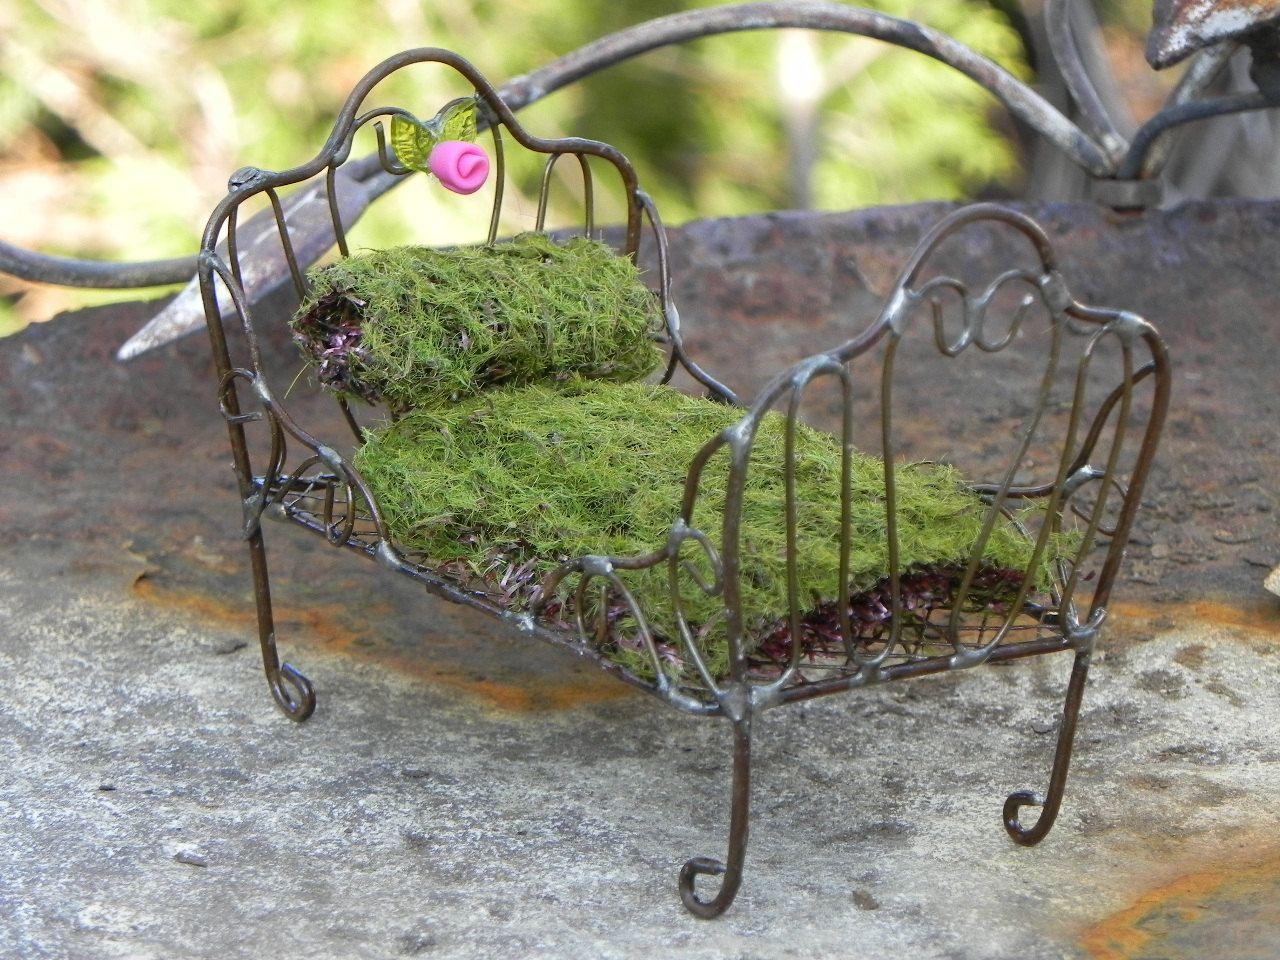 21 Adorable Handmade Fairy Garden Decorations Fairy Gardens and